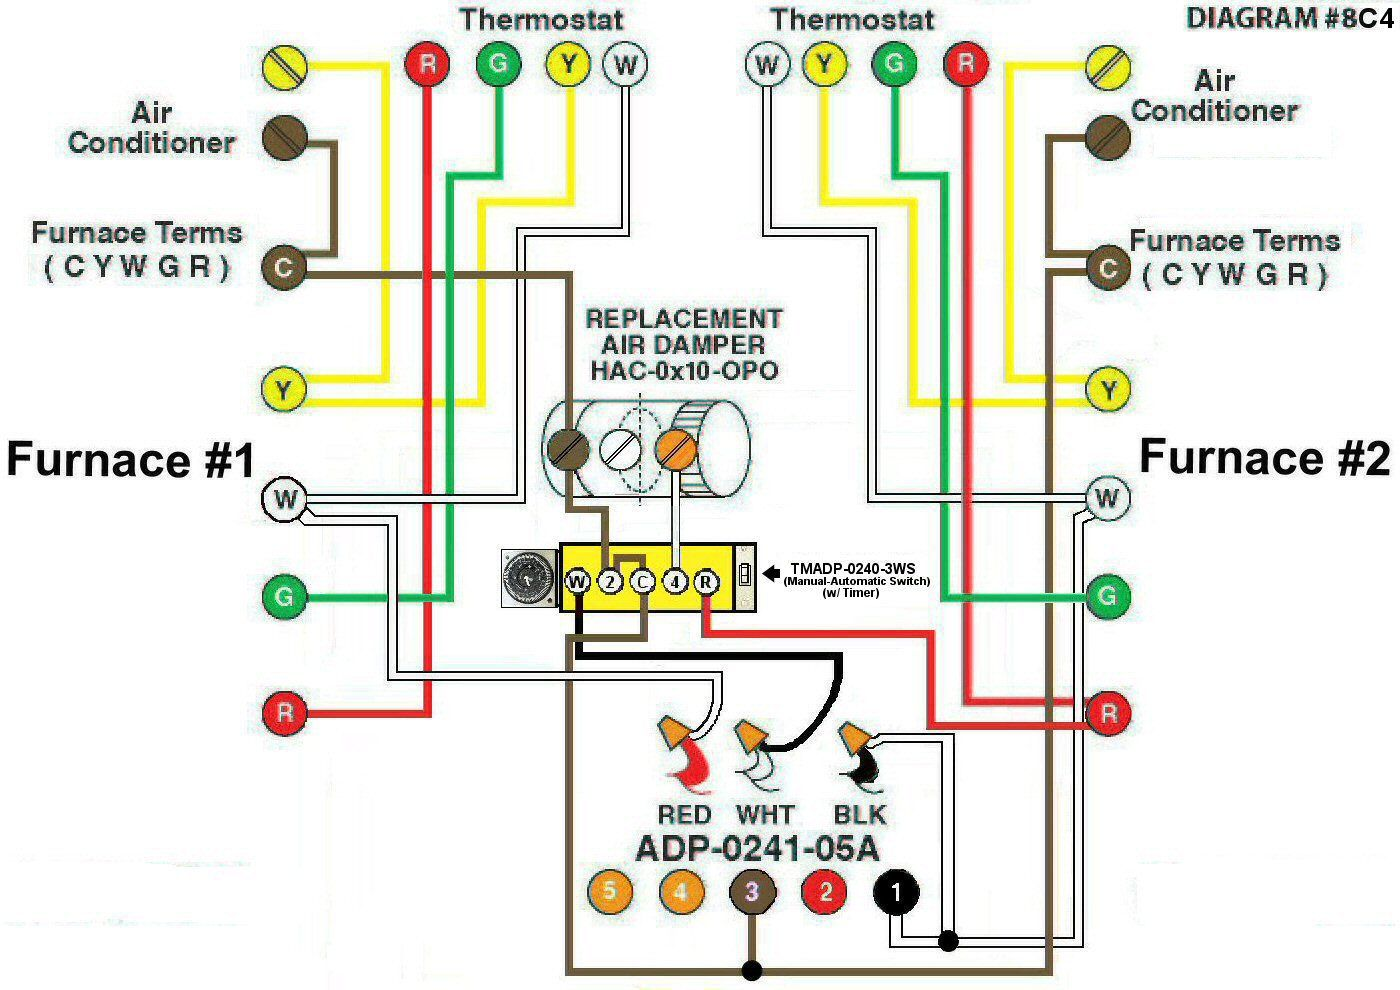 medium resolution of furnace blower wiring diagram me new heat pinterest wire and basic hvac blower wiring